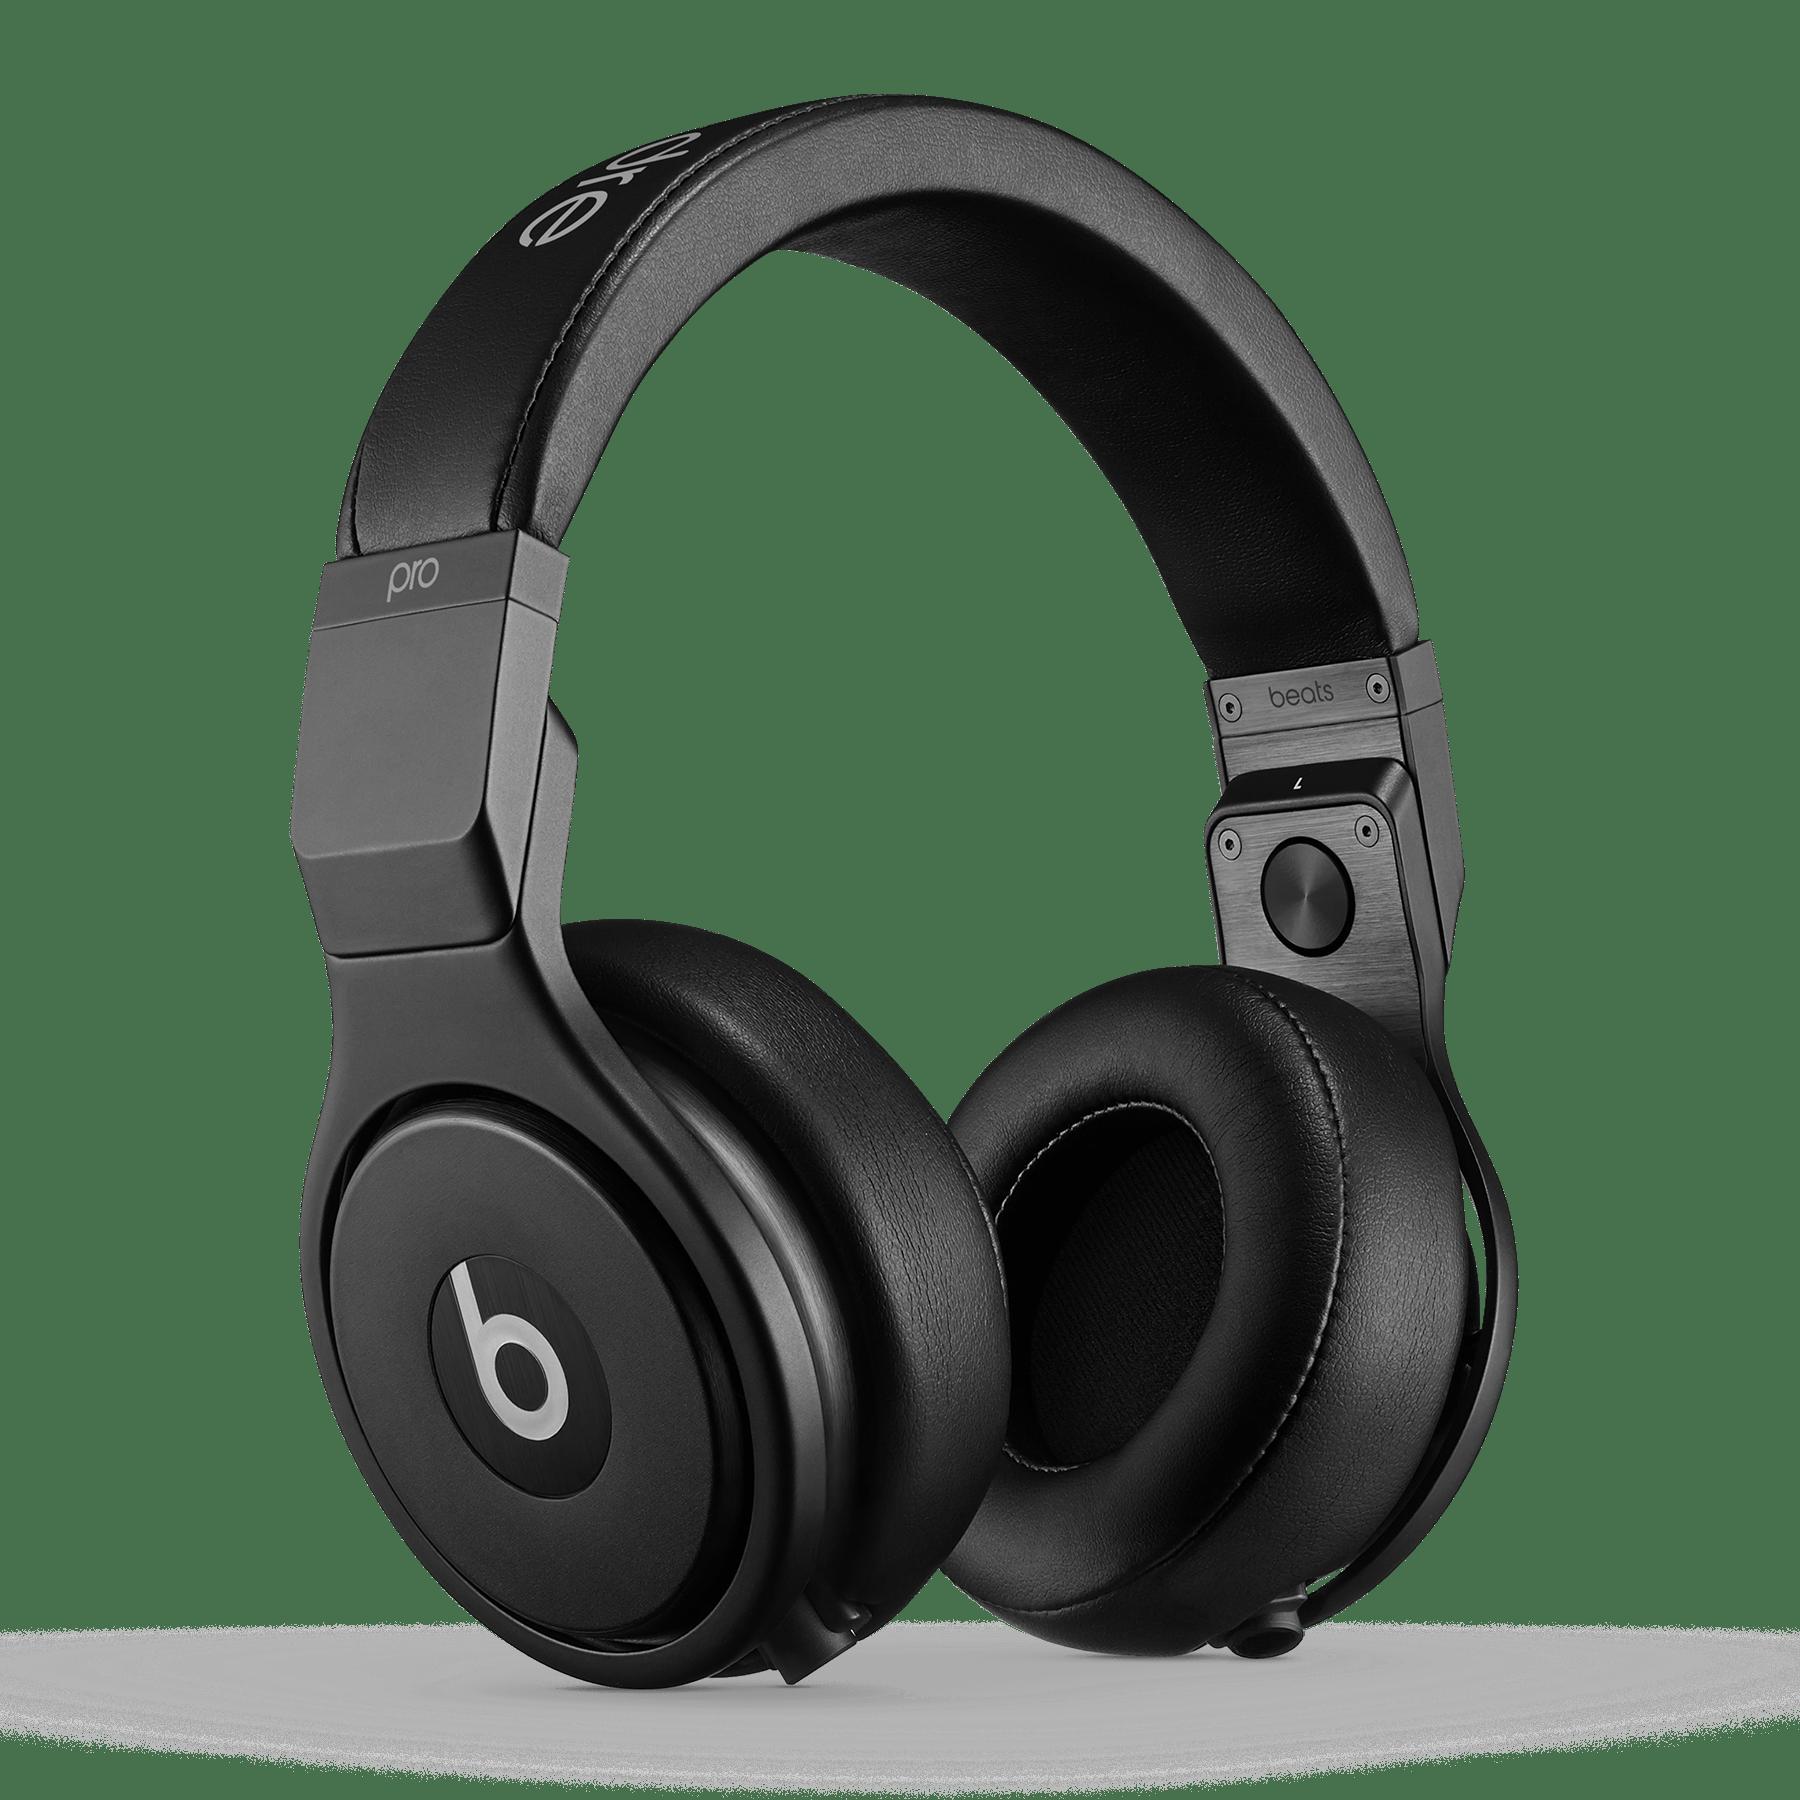 Beats wireless headphones gloss black - beats audio headphones